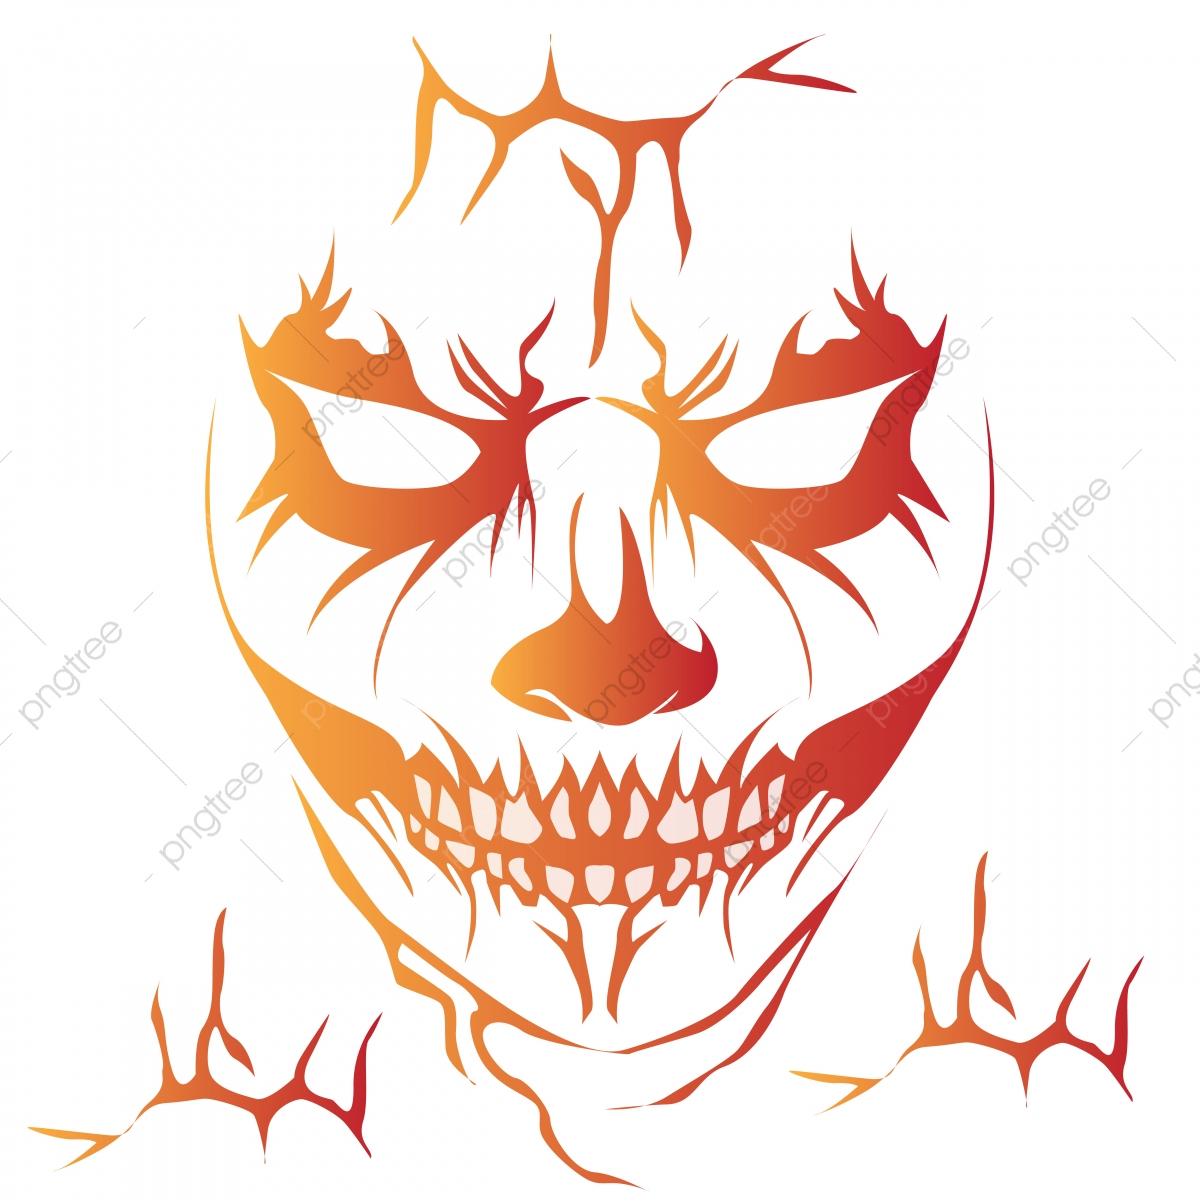 Totenkopf Logo Design Template, Schädel, Symbol, Emblem Png ganzes Totenkopf Vorlage